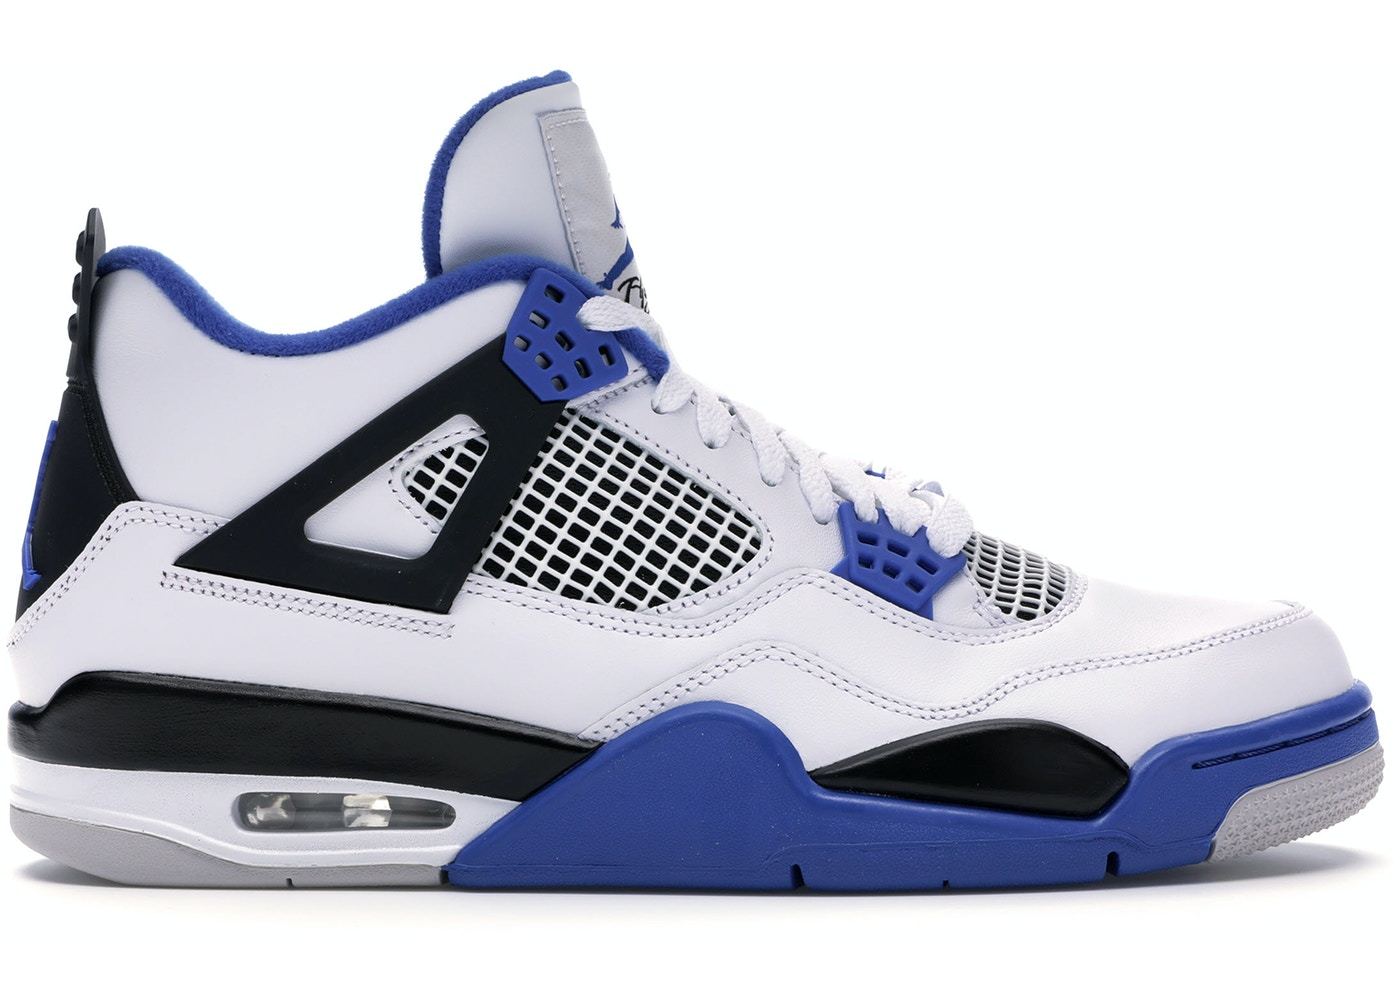 1d914f0f6d4b46 Buy Air Jordan 4 Shoes   Deadstock Sneakers